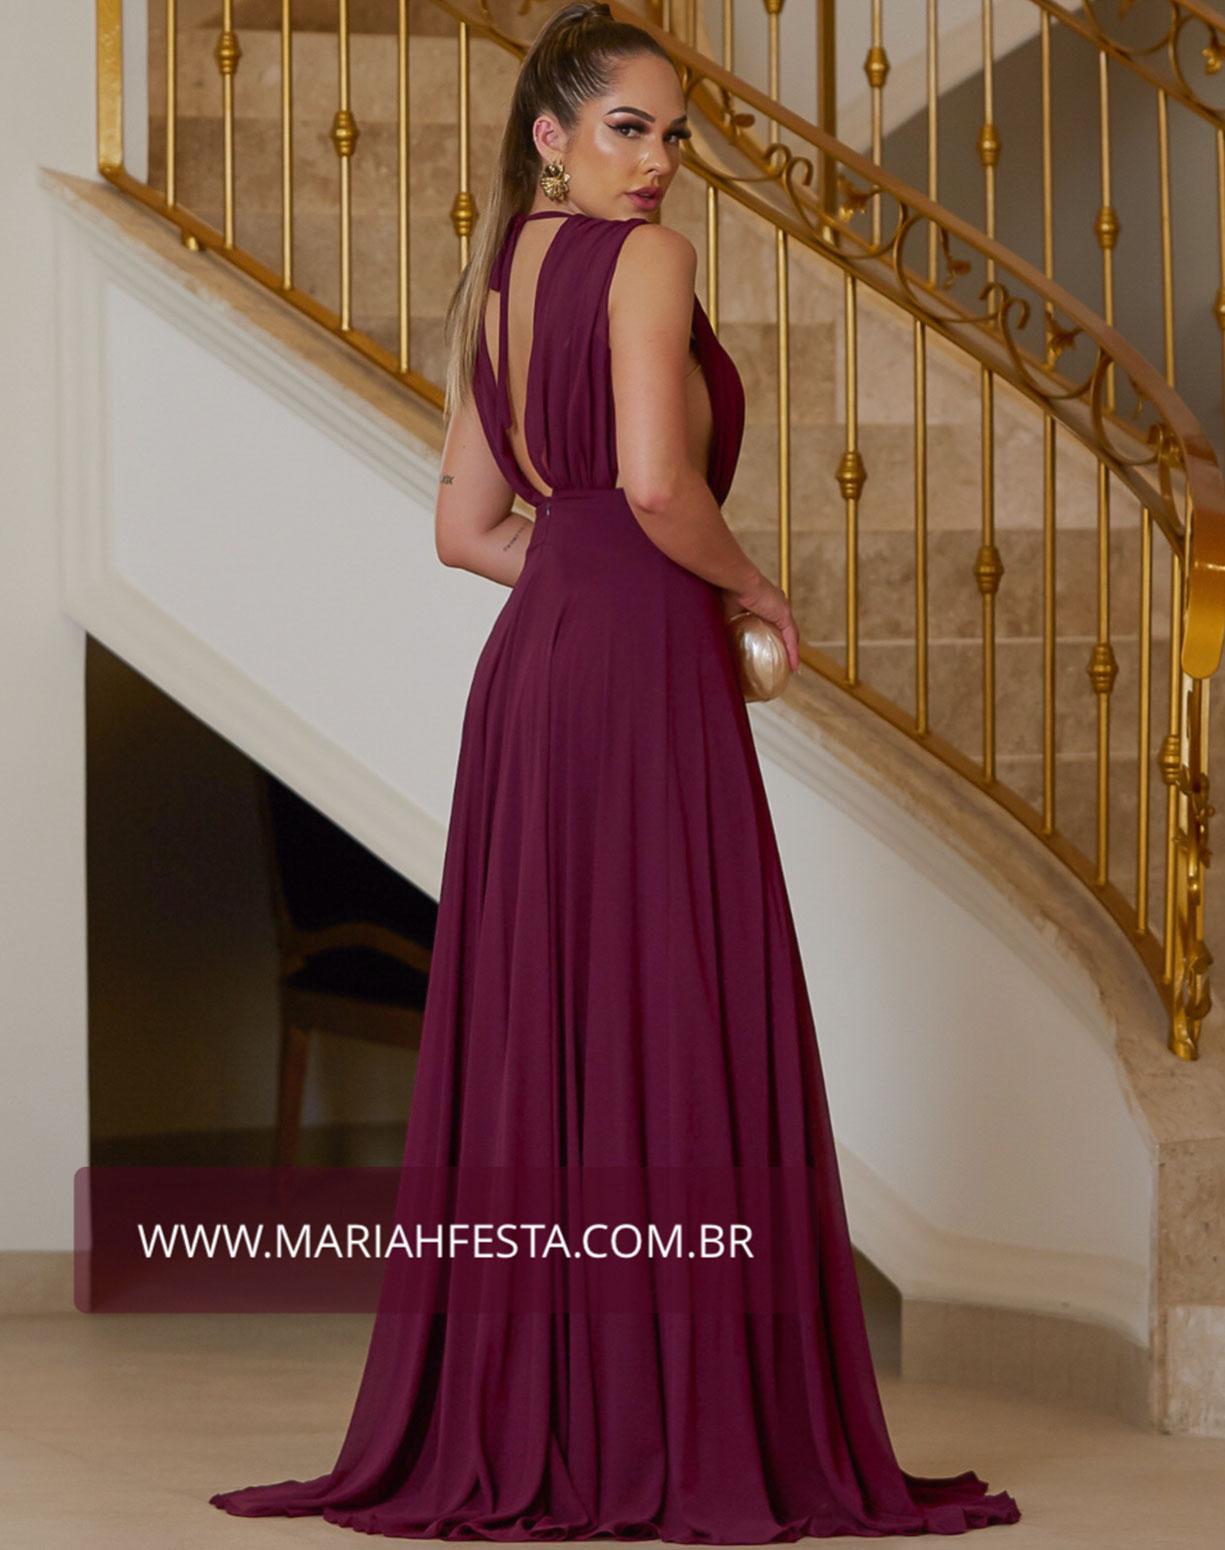 Vestido Uva com Saia Evasê